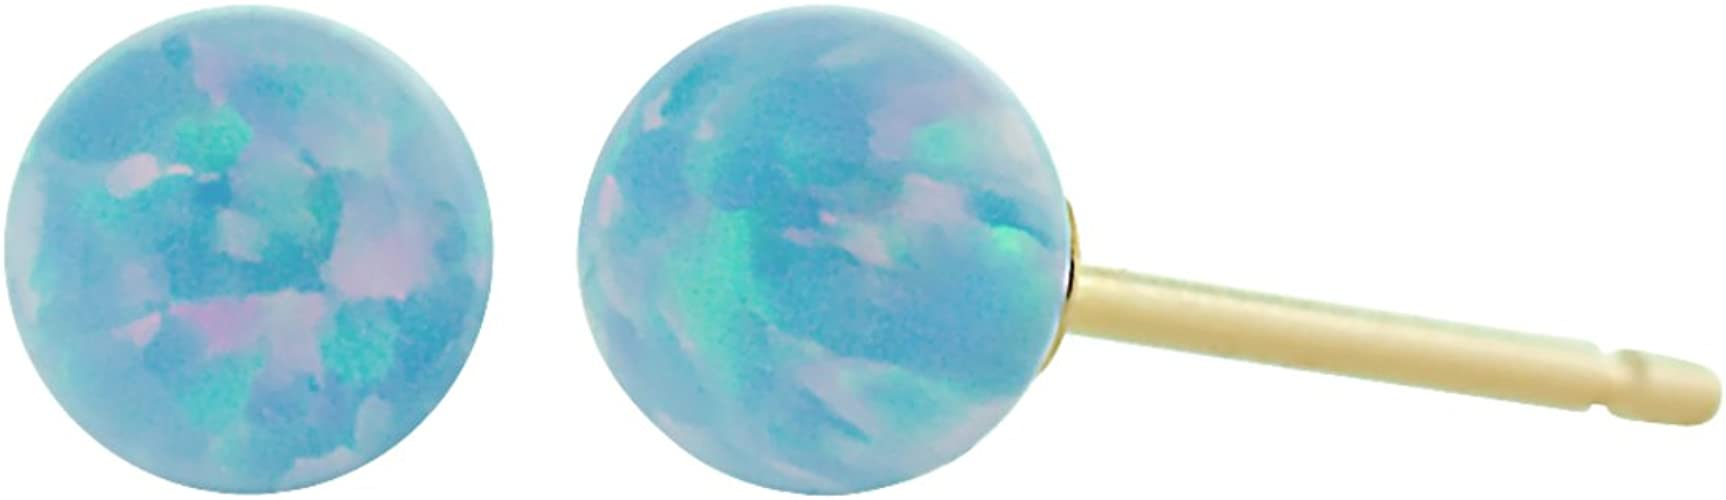 Trustmark 14K White Gold Mimosa Pink Synthetic Opal Ball Stud Post Earrings